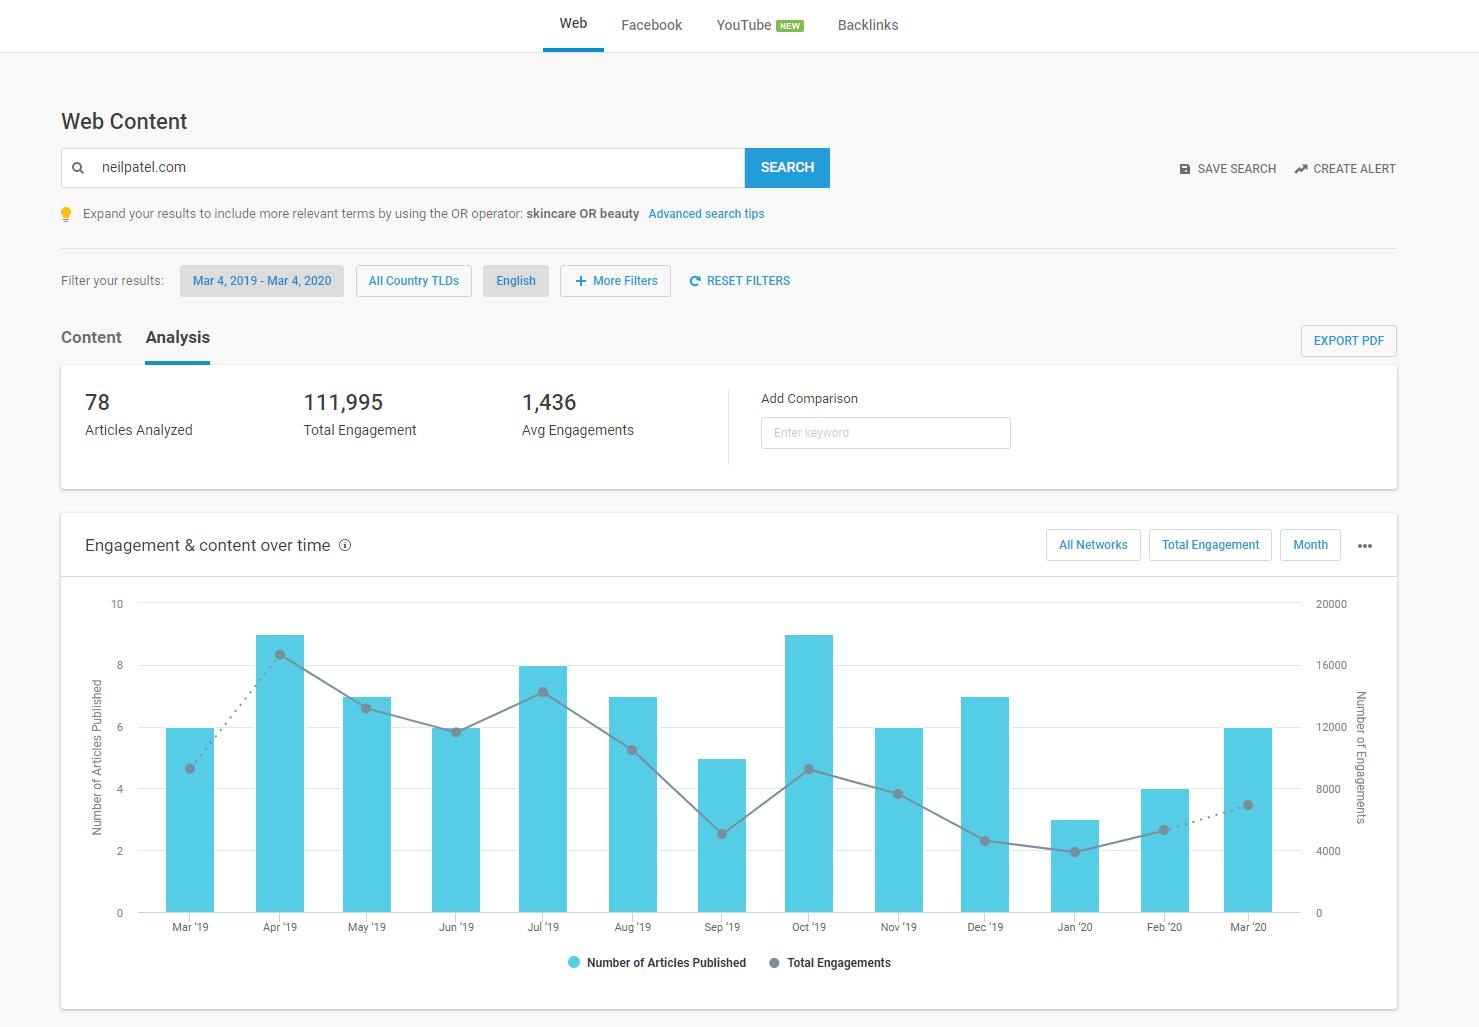 Neil Patel Content Analysis Articles Written Number BuzzSumo